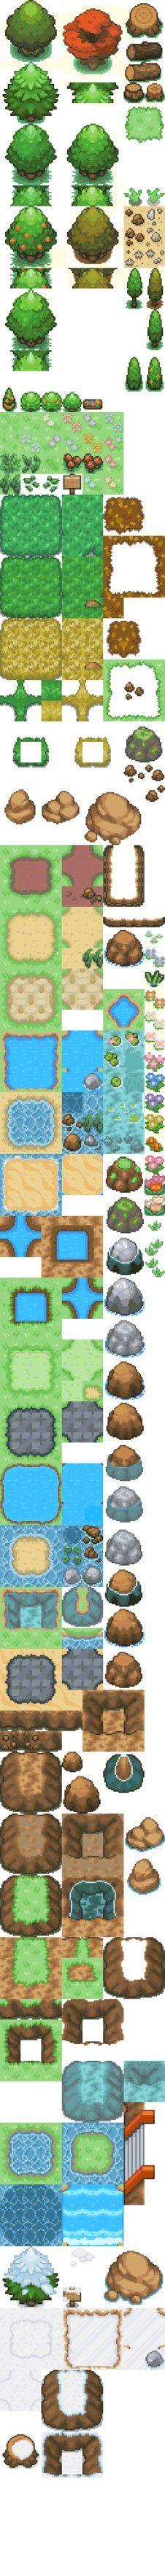 tileset pokemon RPGMAKER XP by kutoal on deviantART